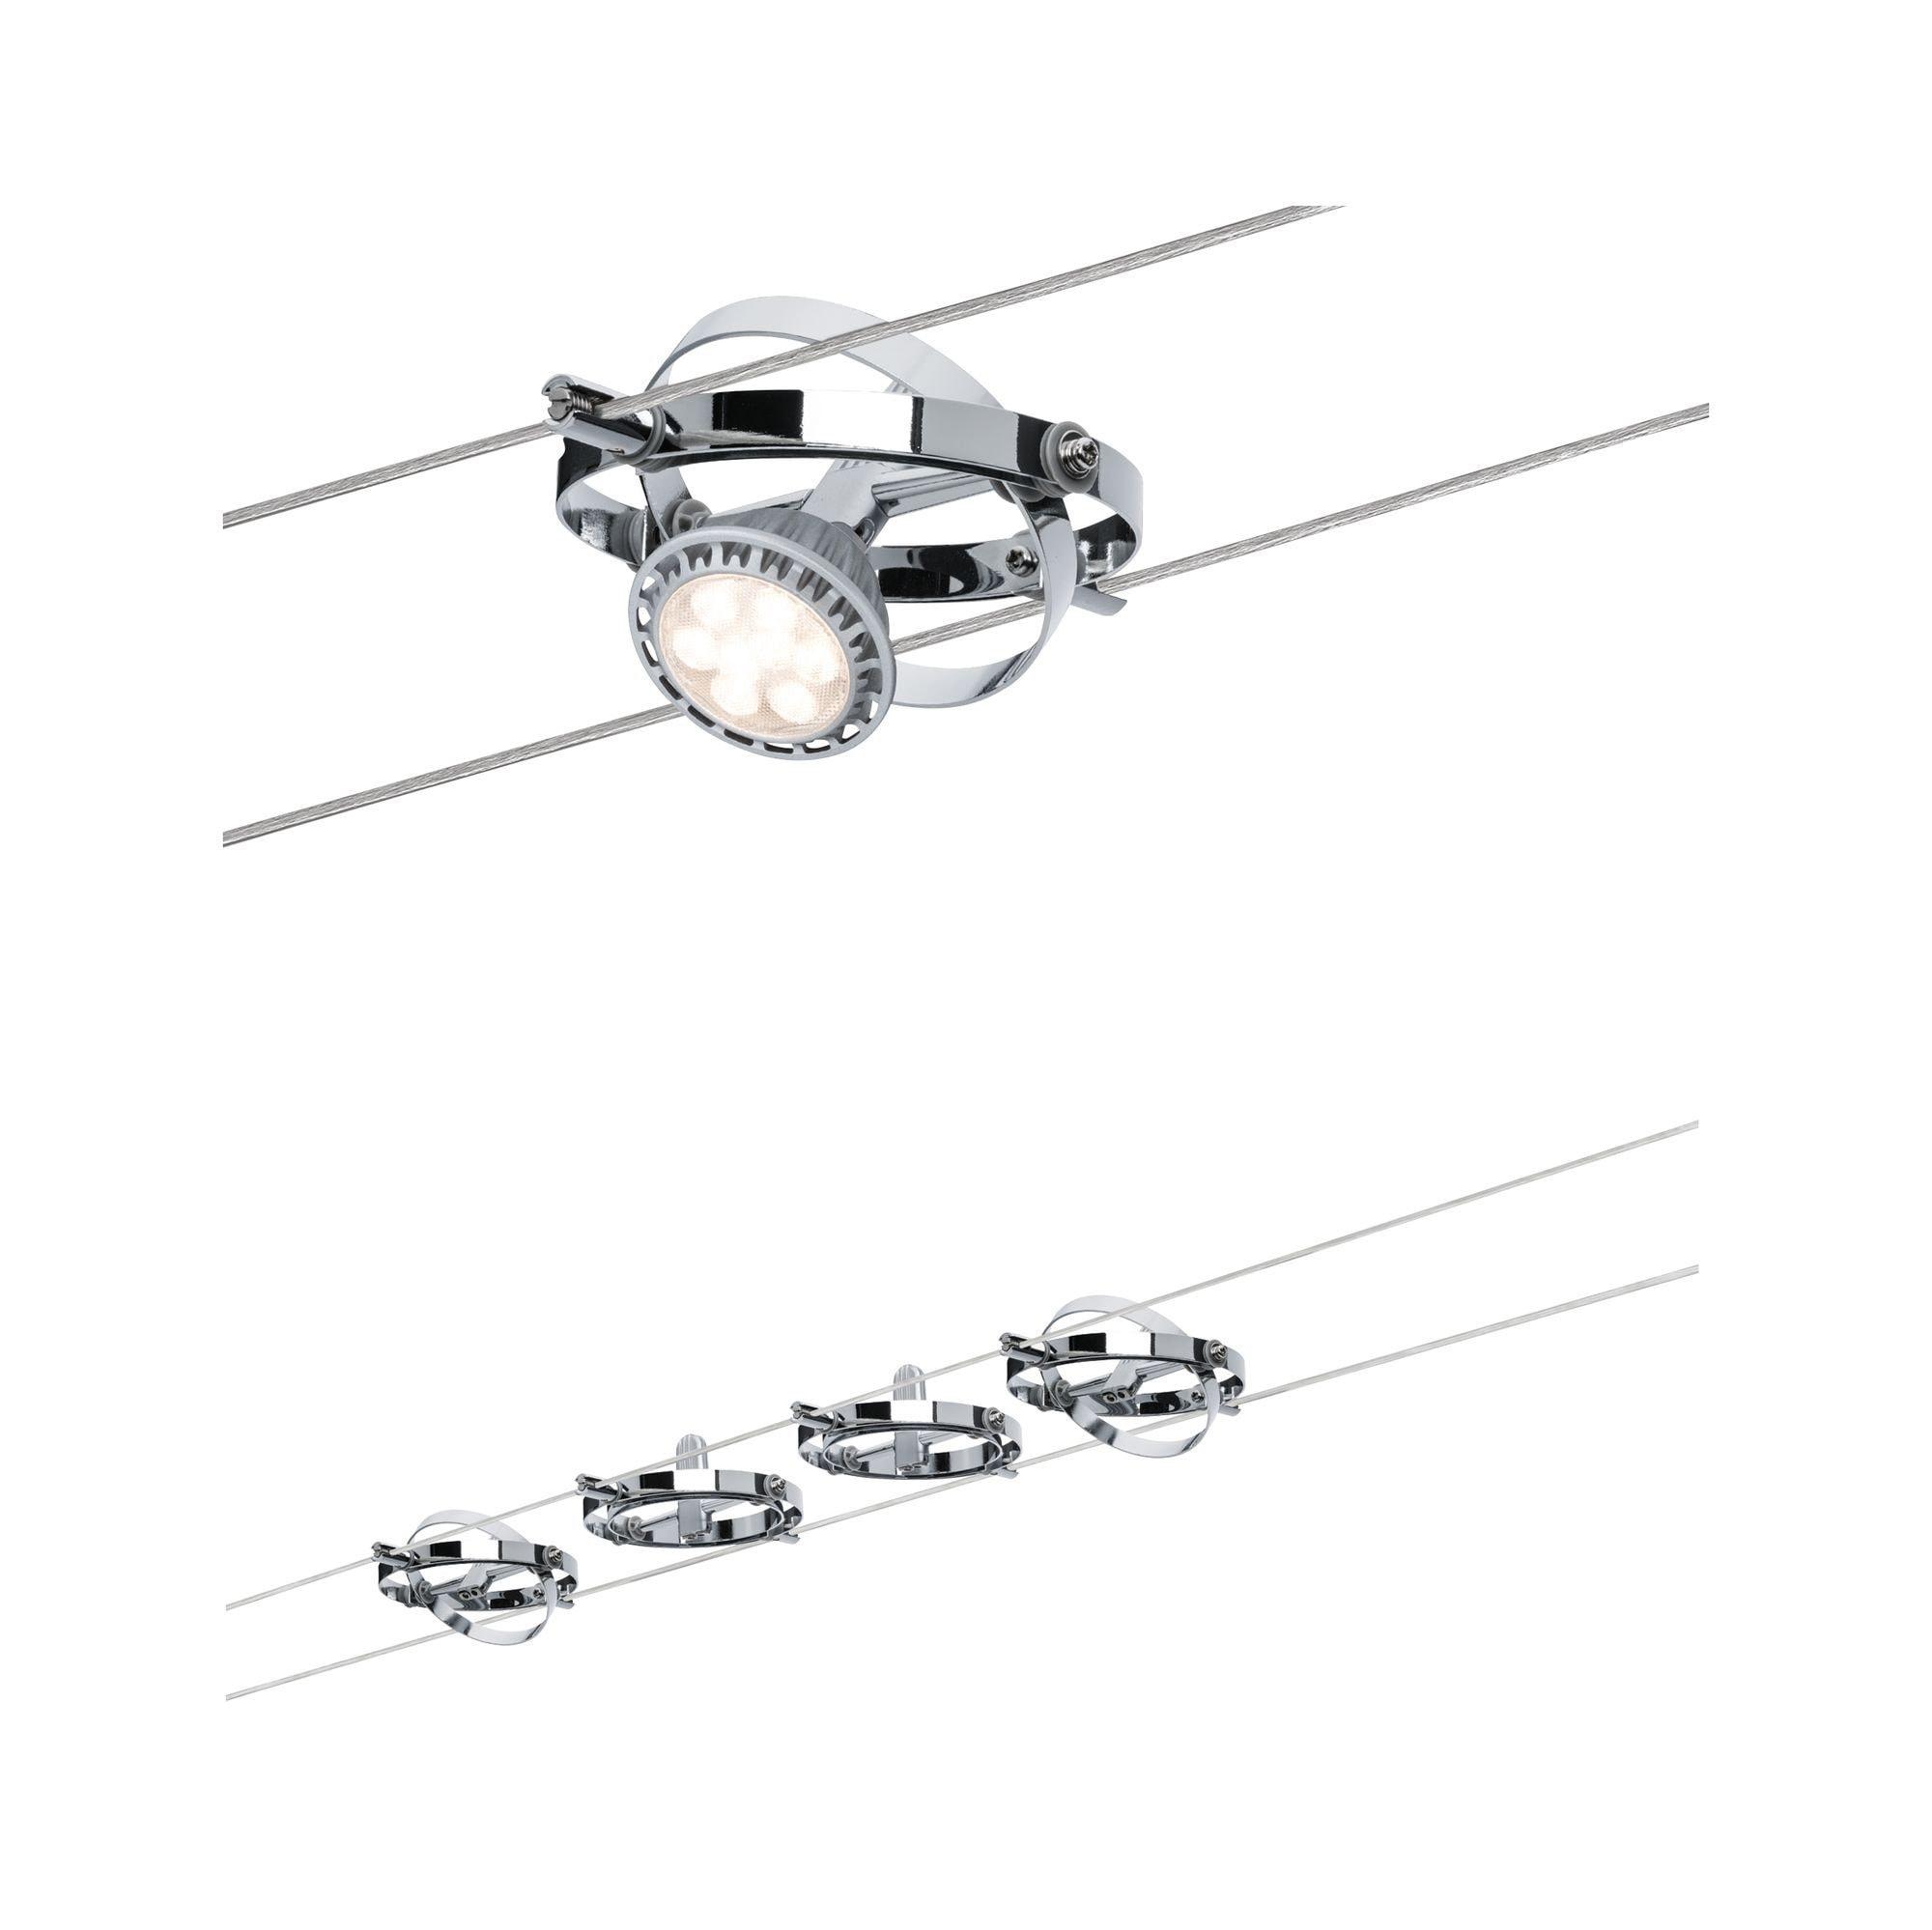 Paulmann LED Deckenleuchte Seilsystem Cardan Chrom mit 4 Spots max. 10W GU5,3, GU 5,3, 1 St.